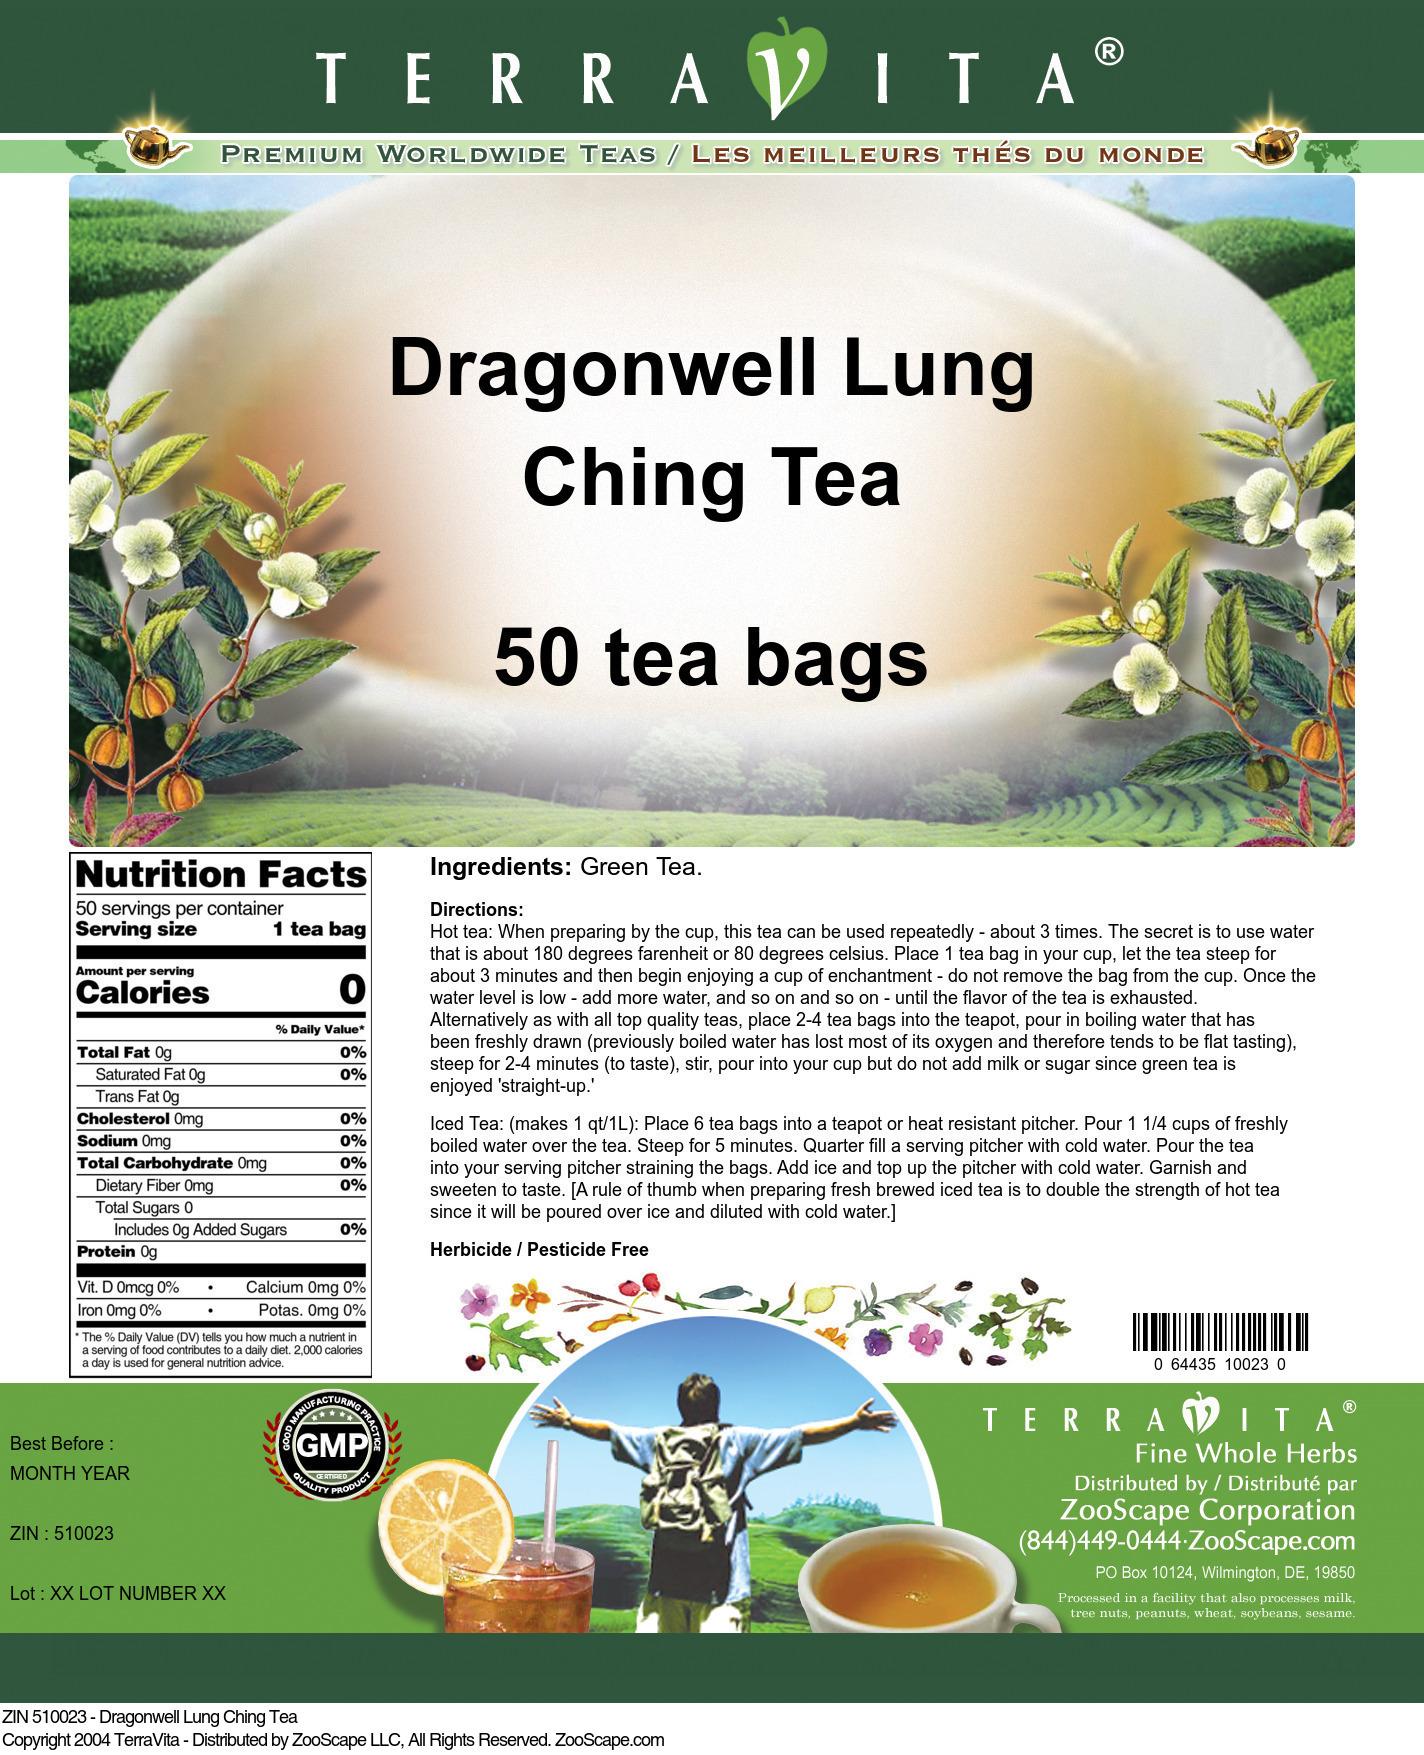 Dragonwell Lung Ching Tea